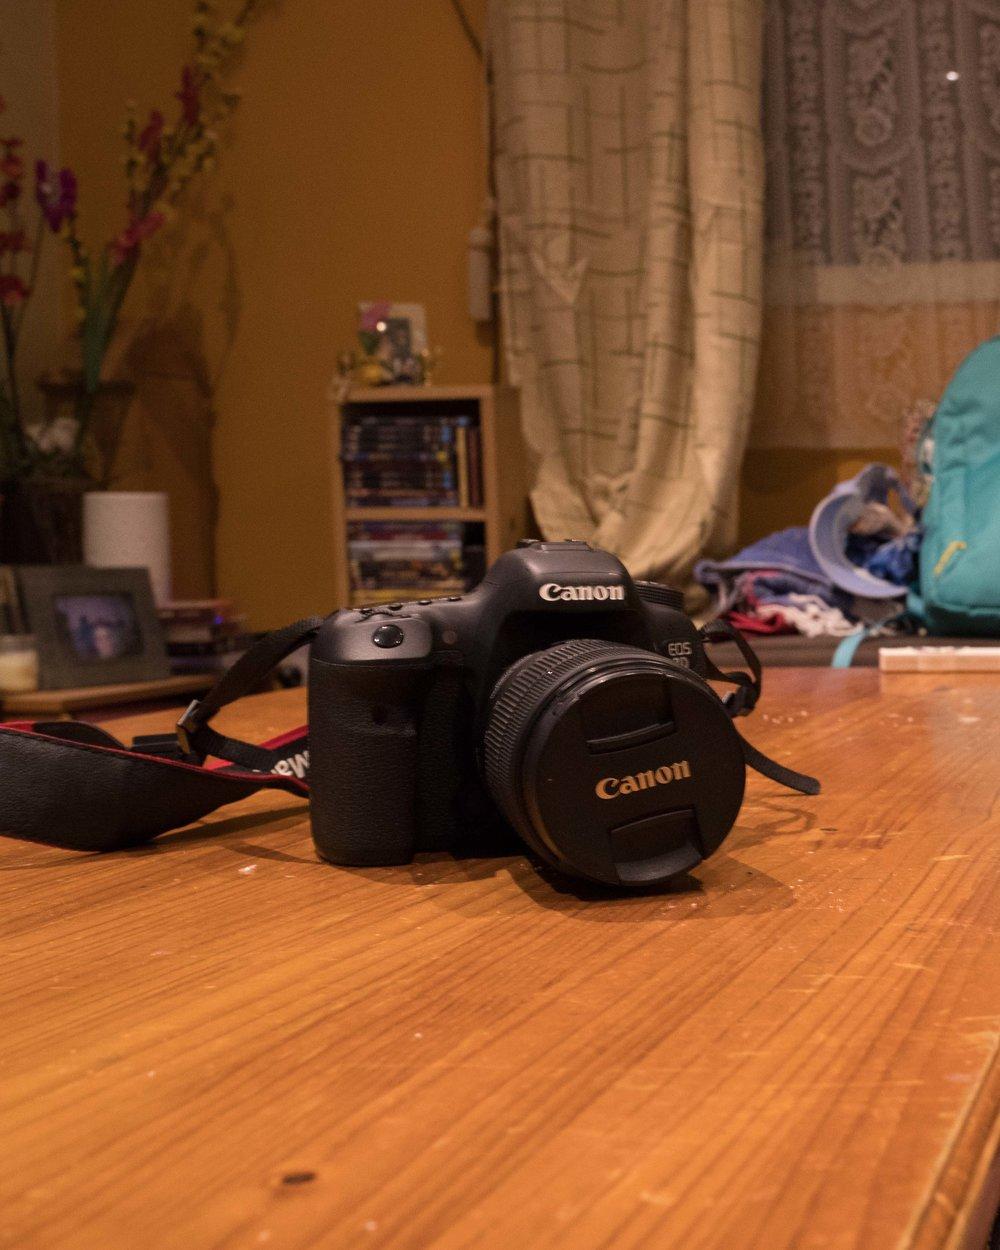 Shot at 35mm Focal- Aperture f11